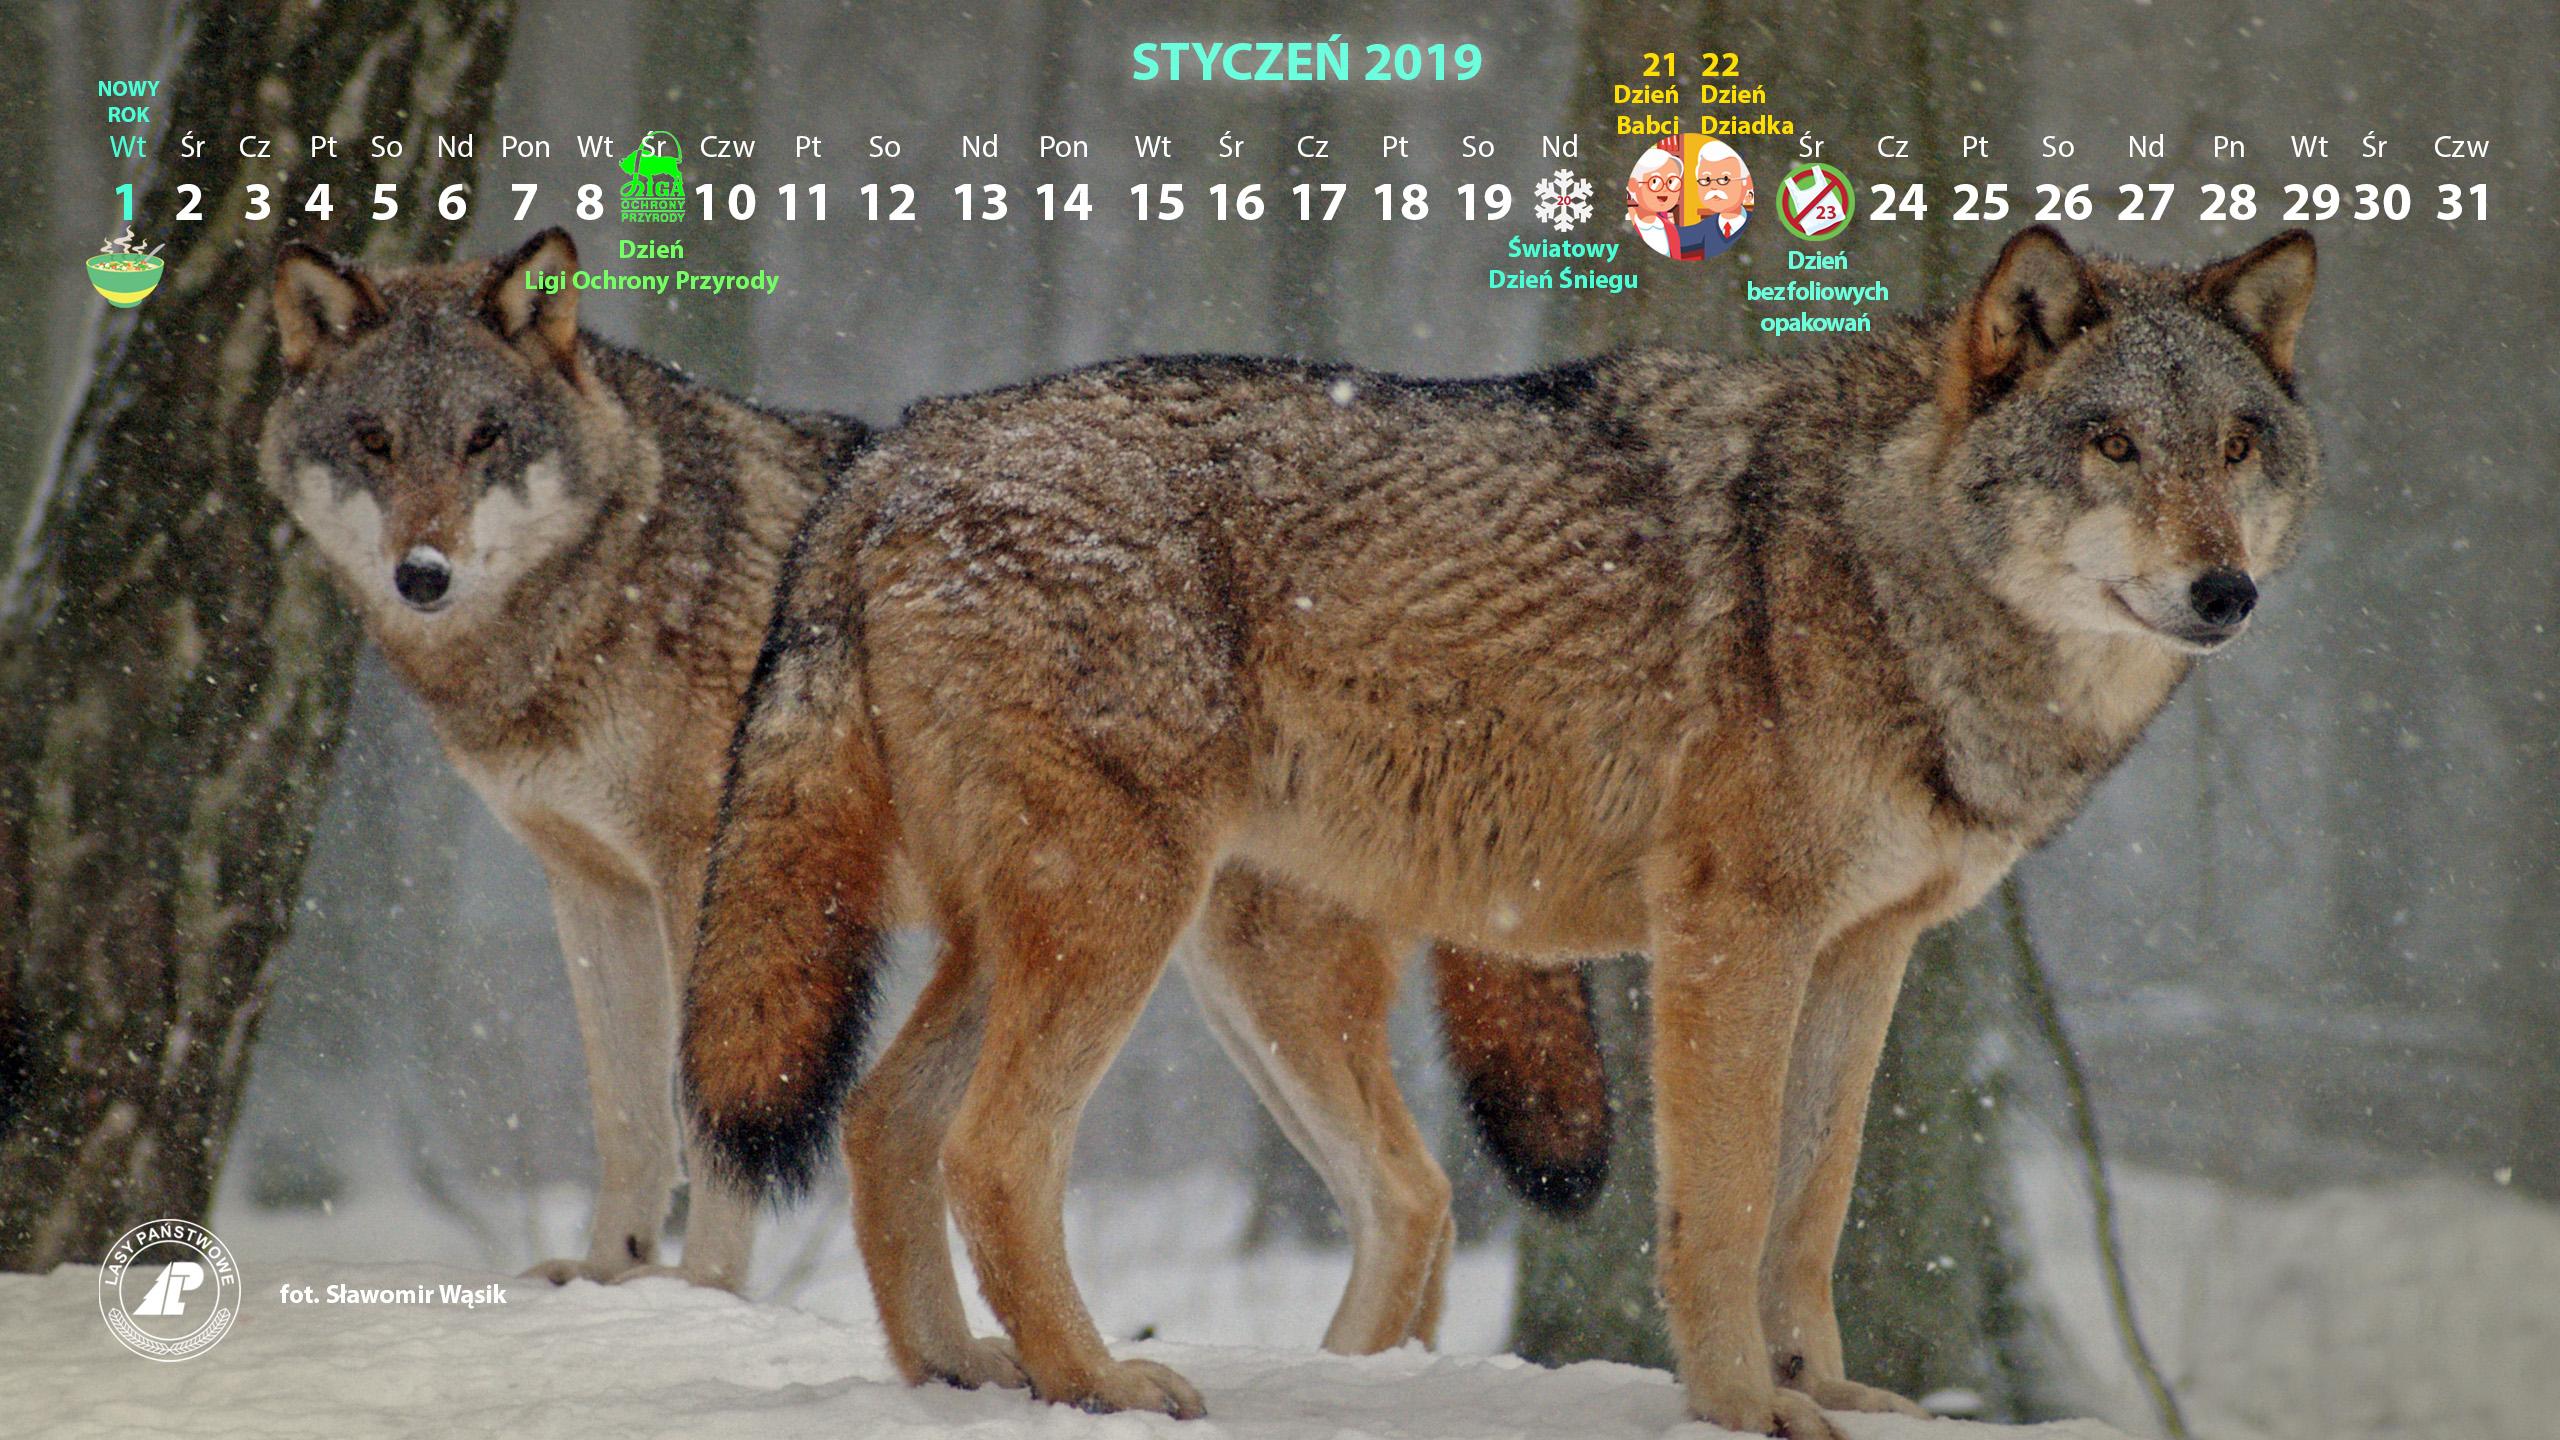 Kalendarz_styczeń_2019_2560x1440[1].jpg